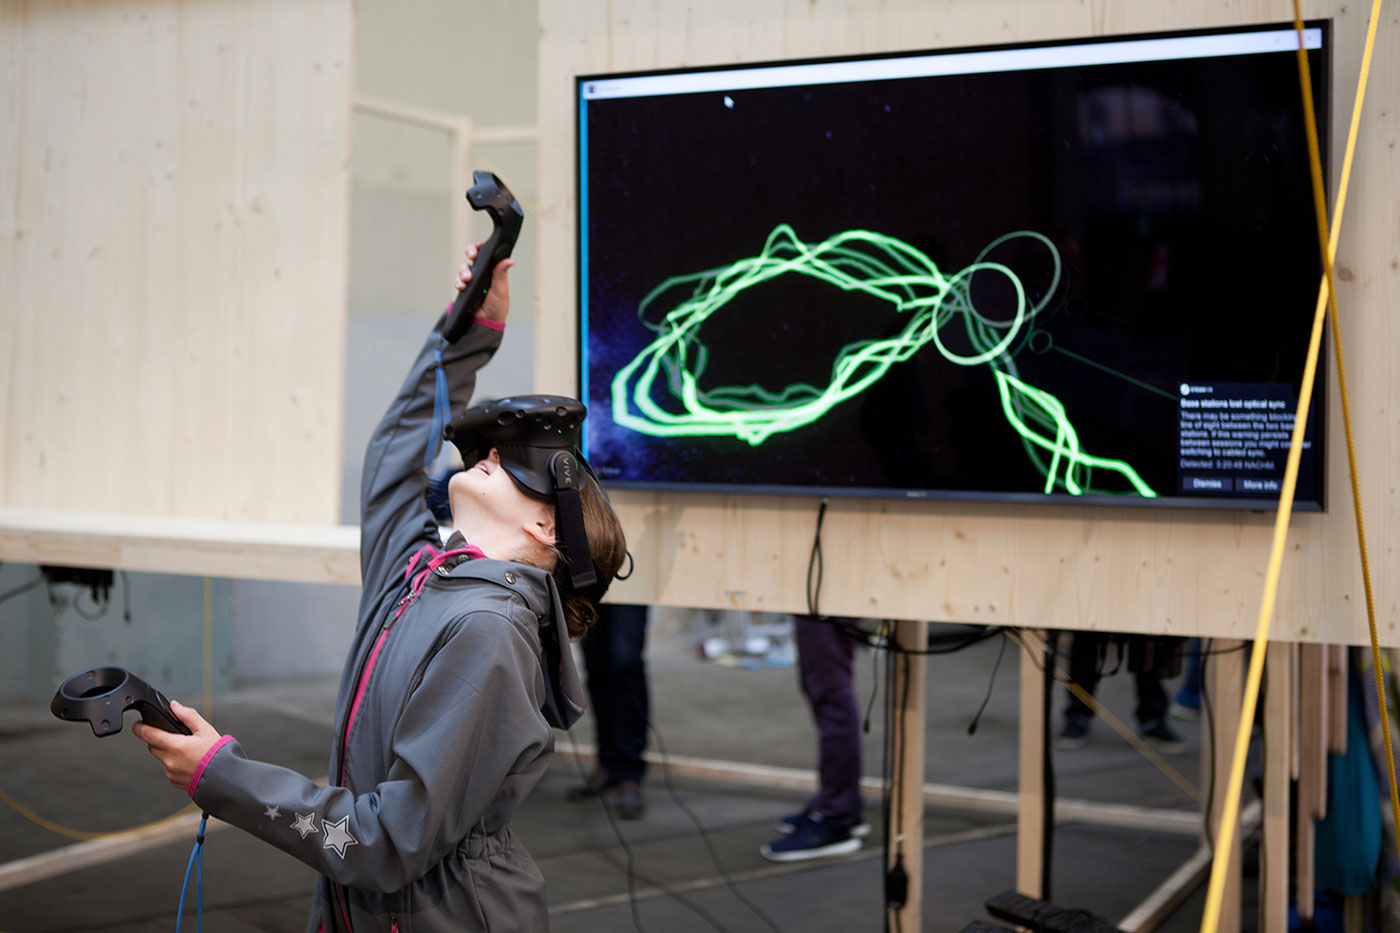 Design Biennale Zürich 2017, Design Ride, ZHdK, Industrial Design (Foto: Lukas Beyeler)